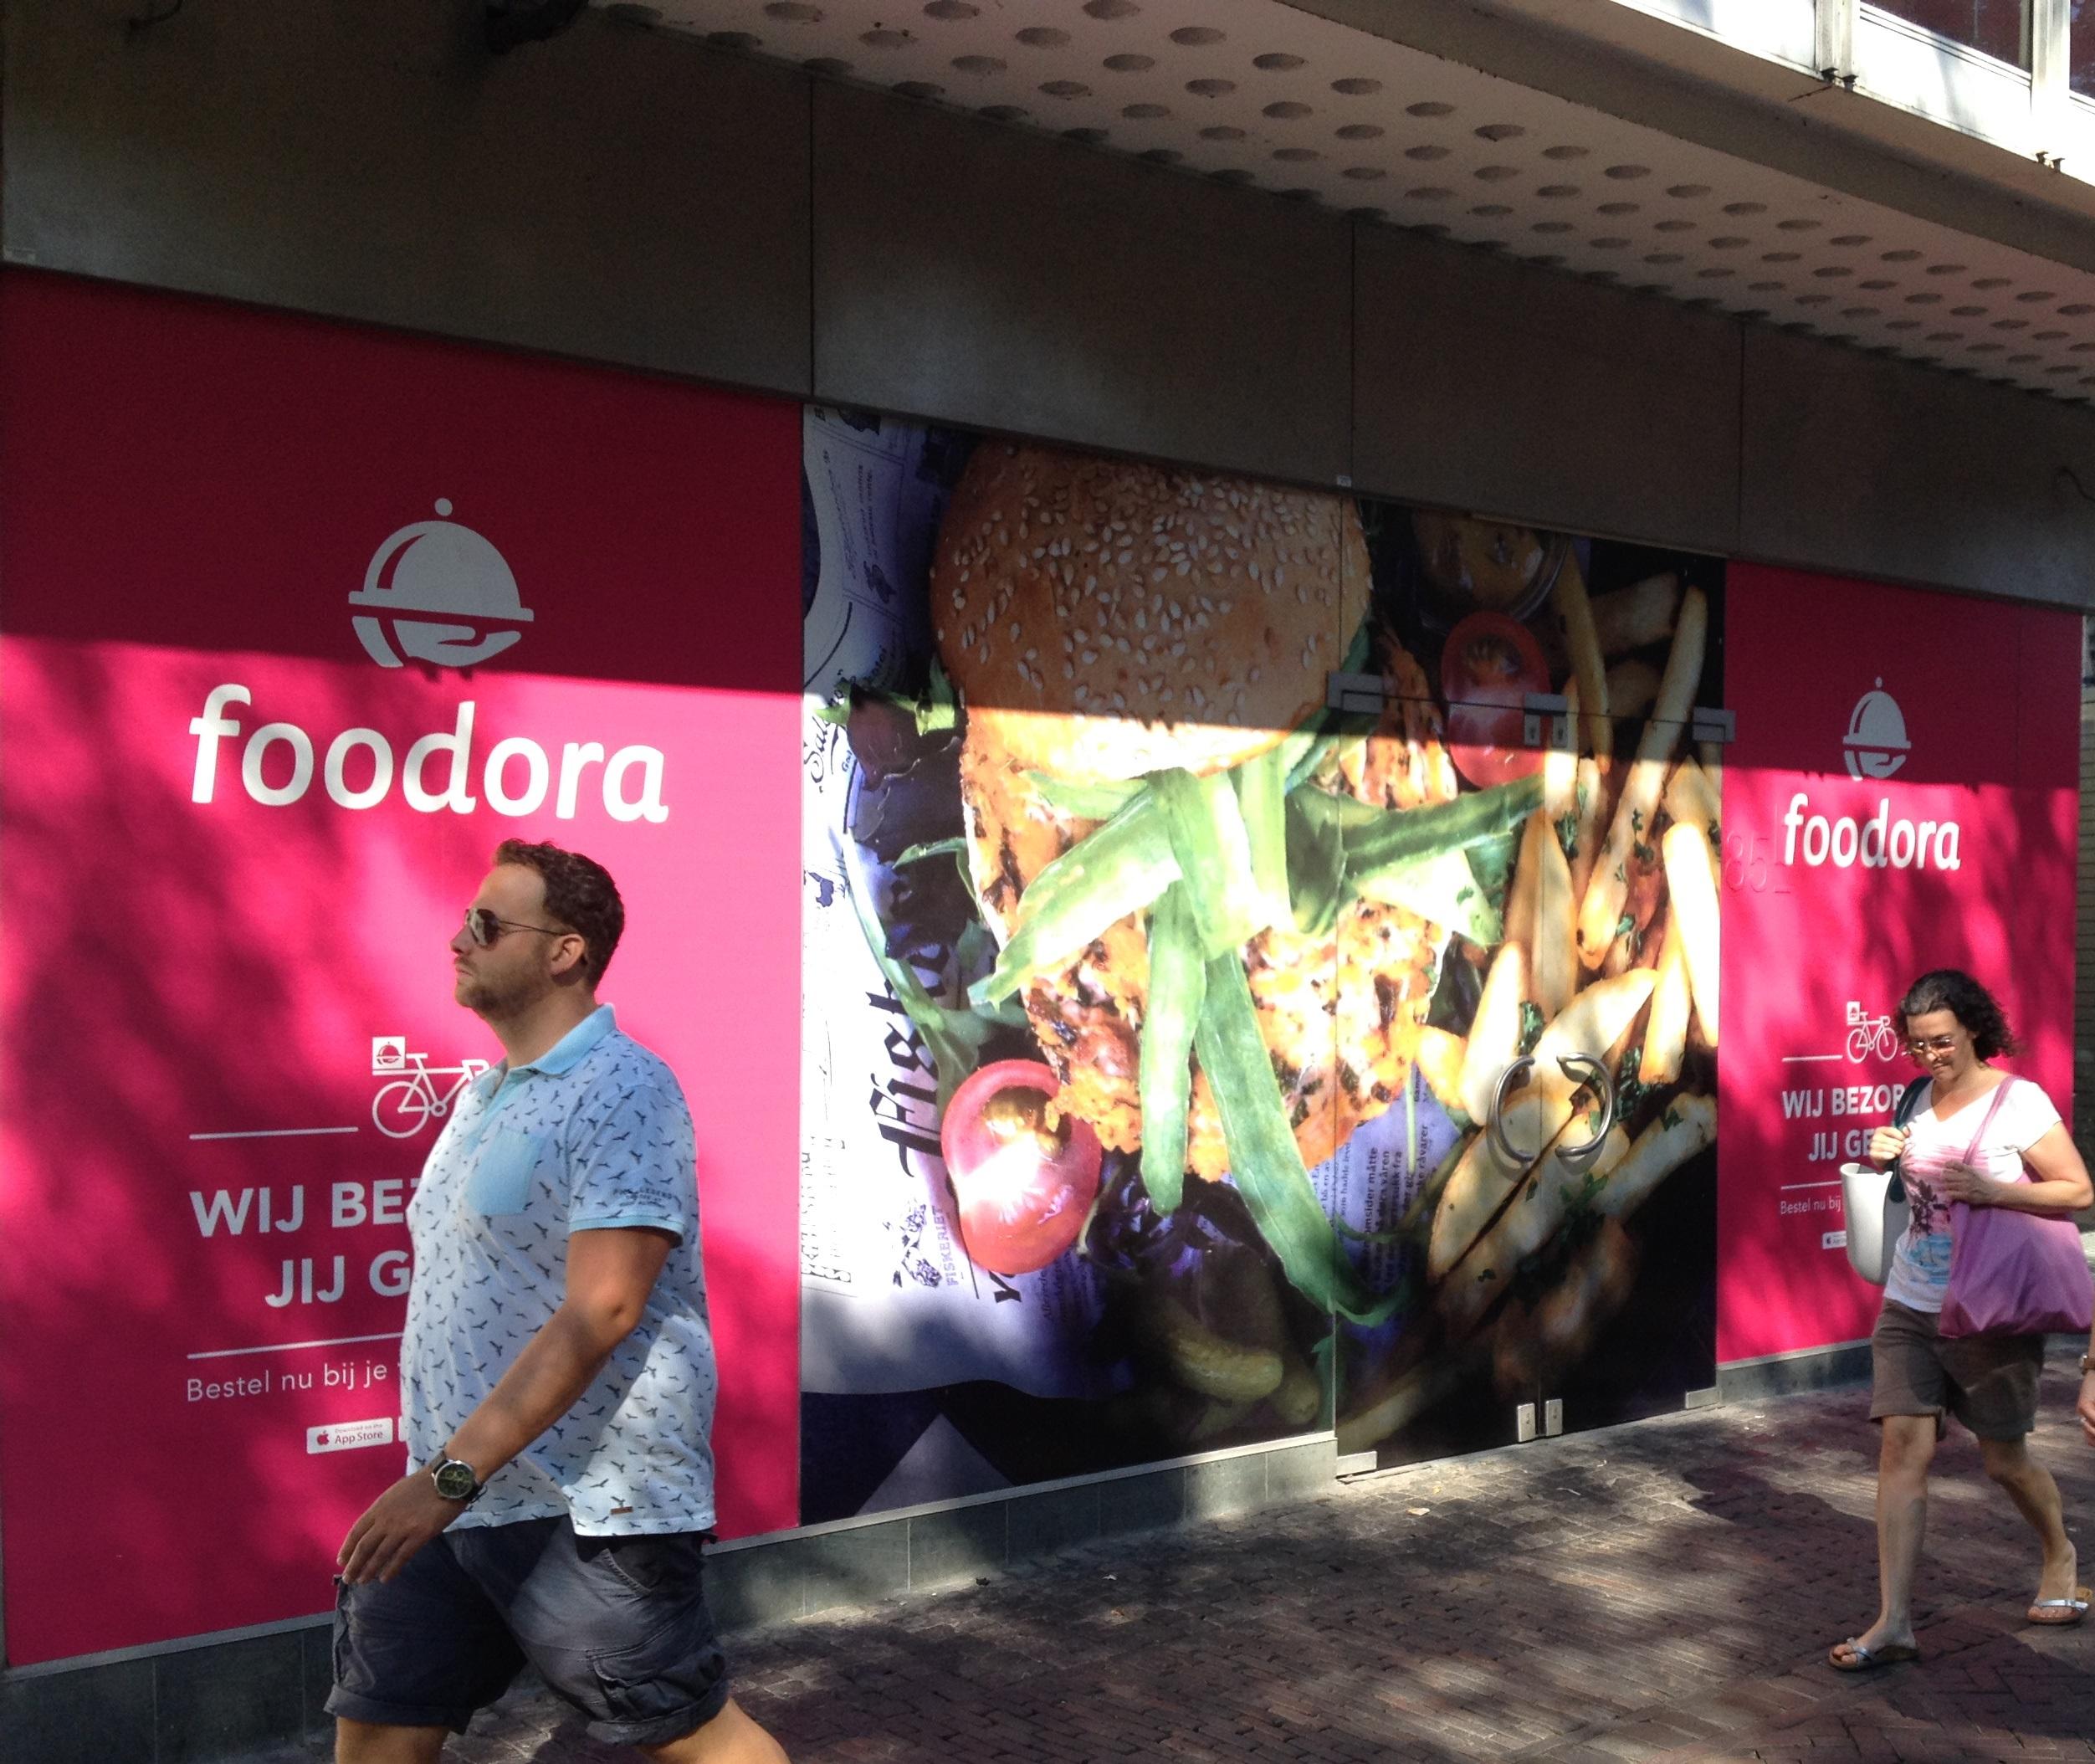 Bestel nu bij Foodora